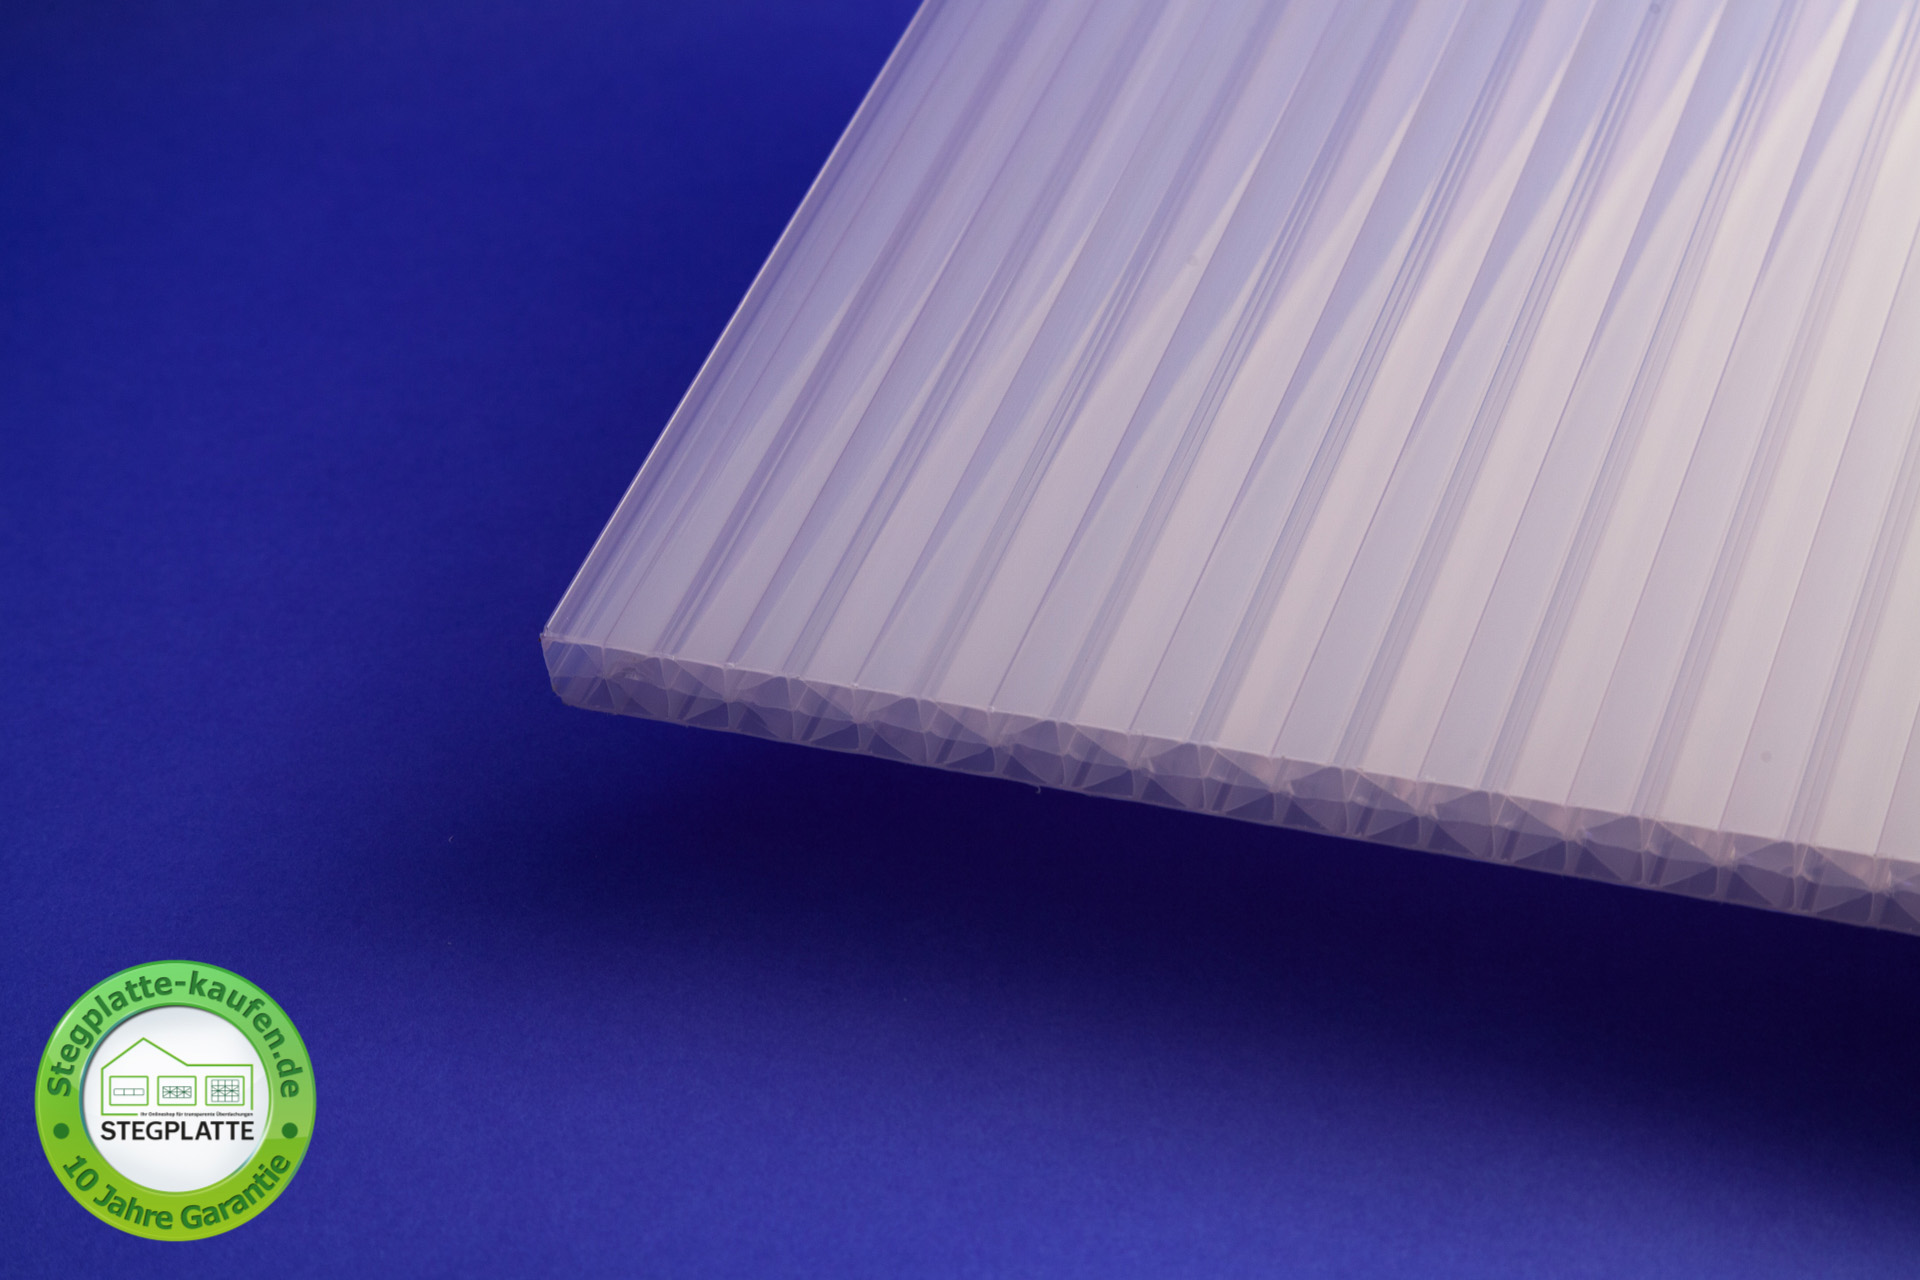 Stegplatte 16 mm Fachwerk opalweiß